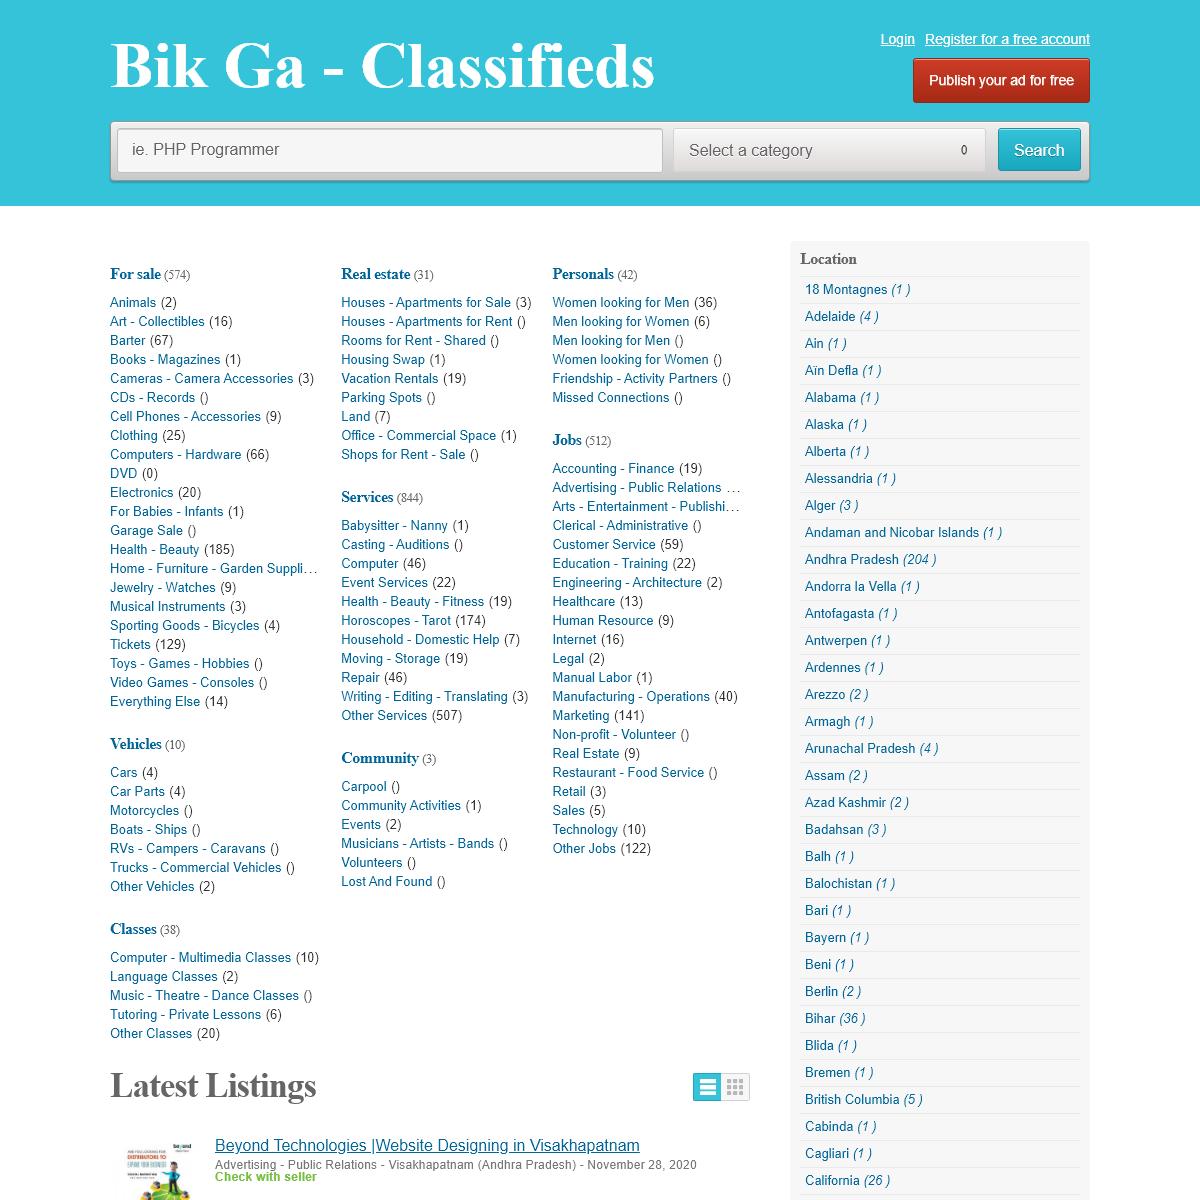 Bik Ga - Classifieds